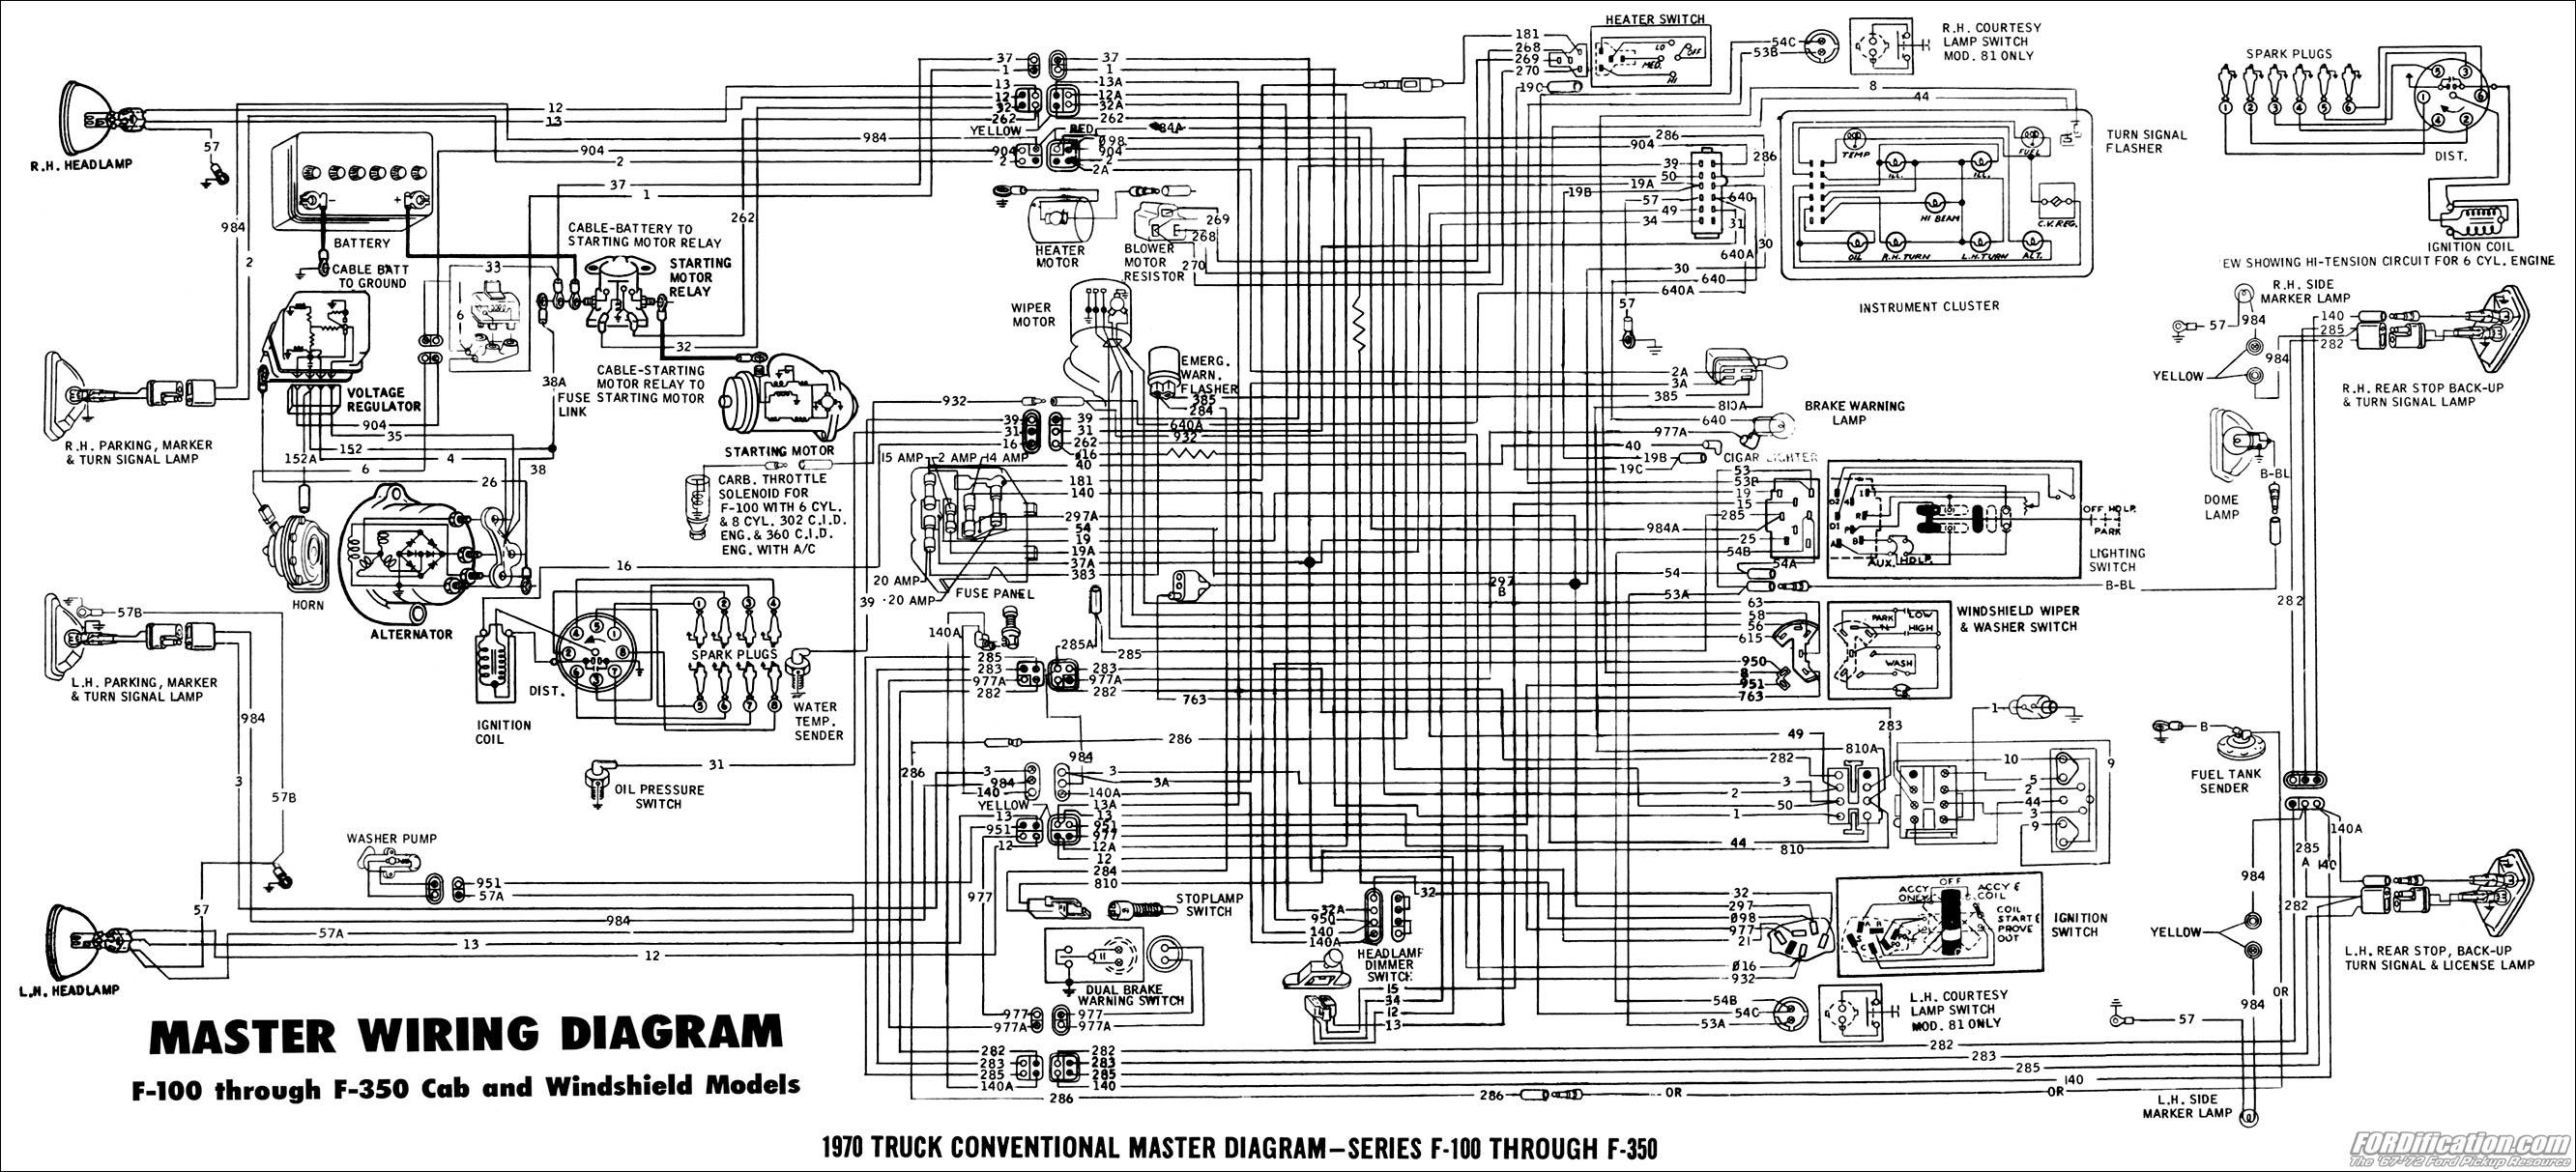 Valet Remote Start Wiring Diagram Schematic Diagrams Avital Hecho 4x03